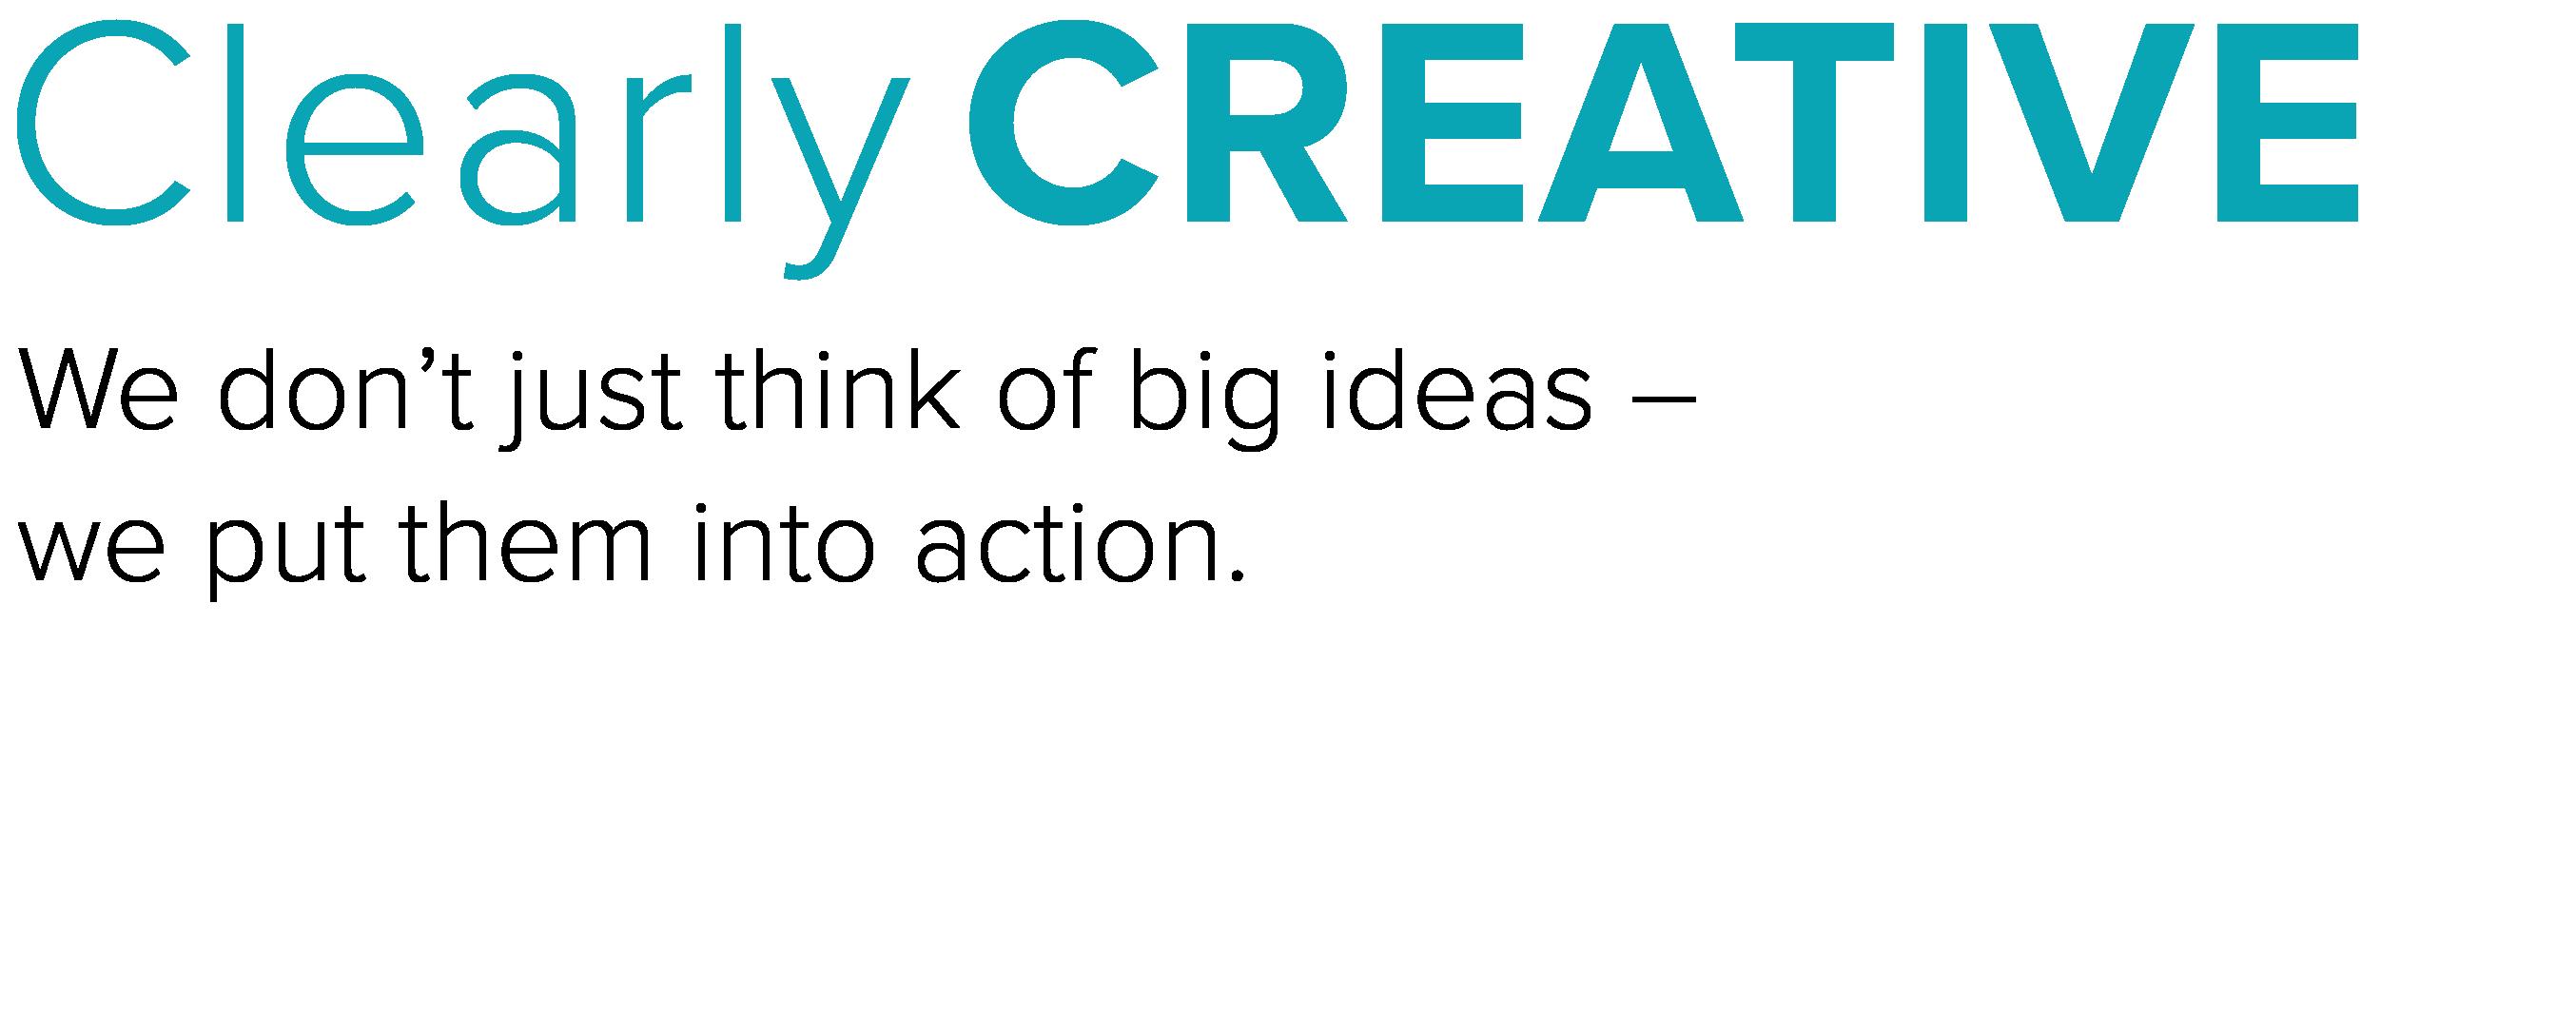 Cleary Creative